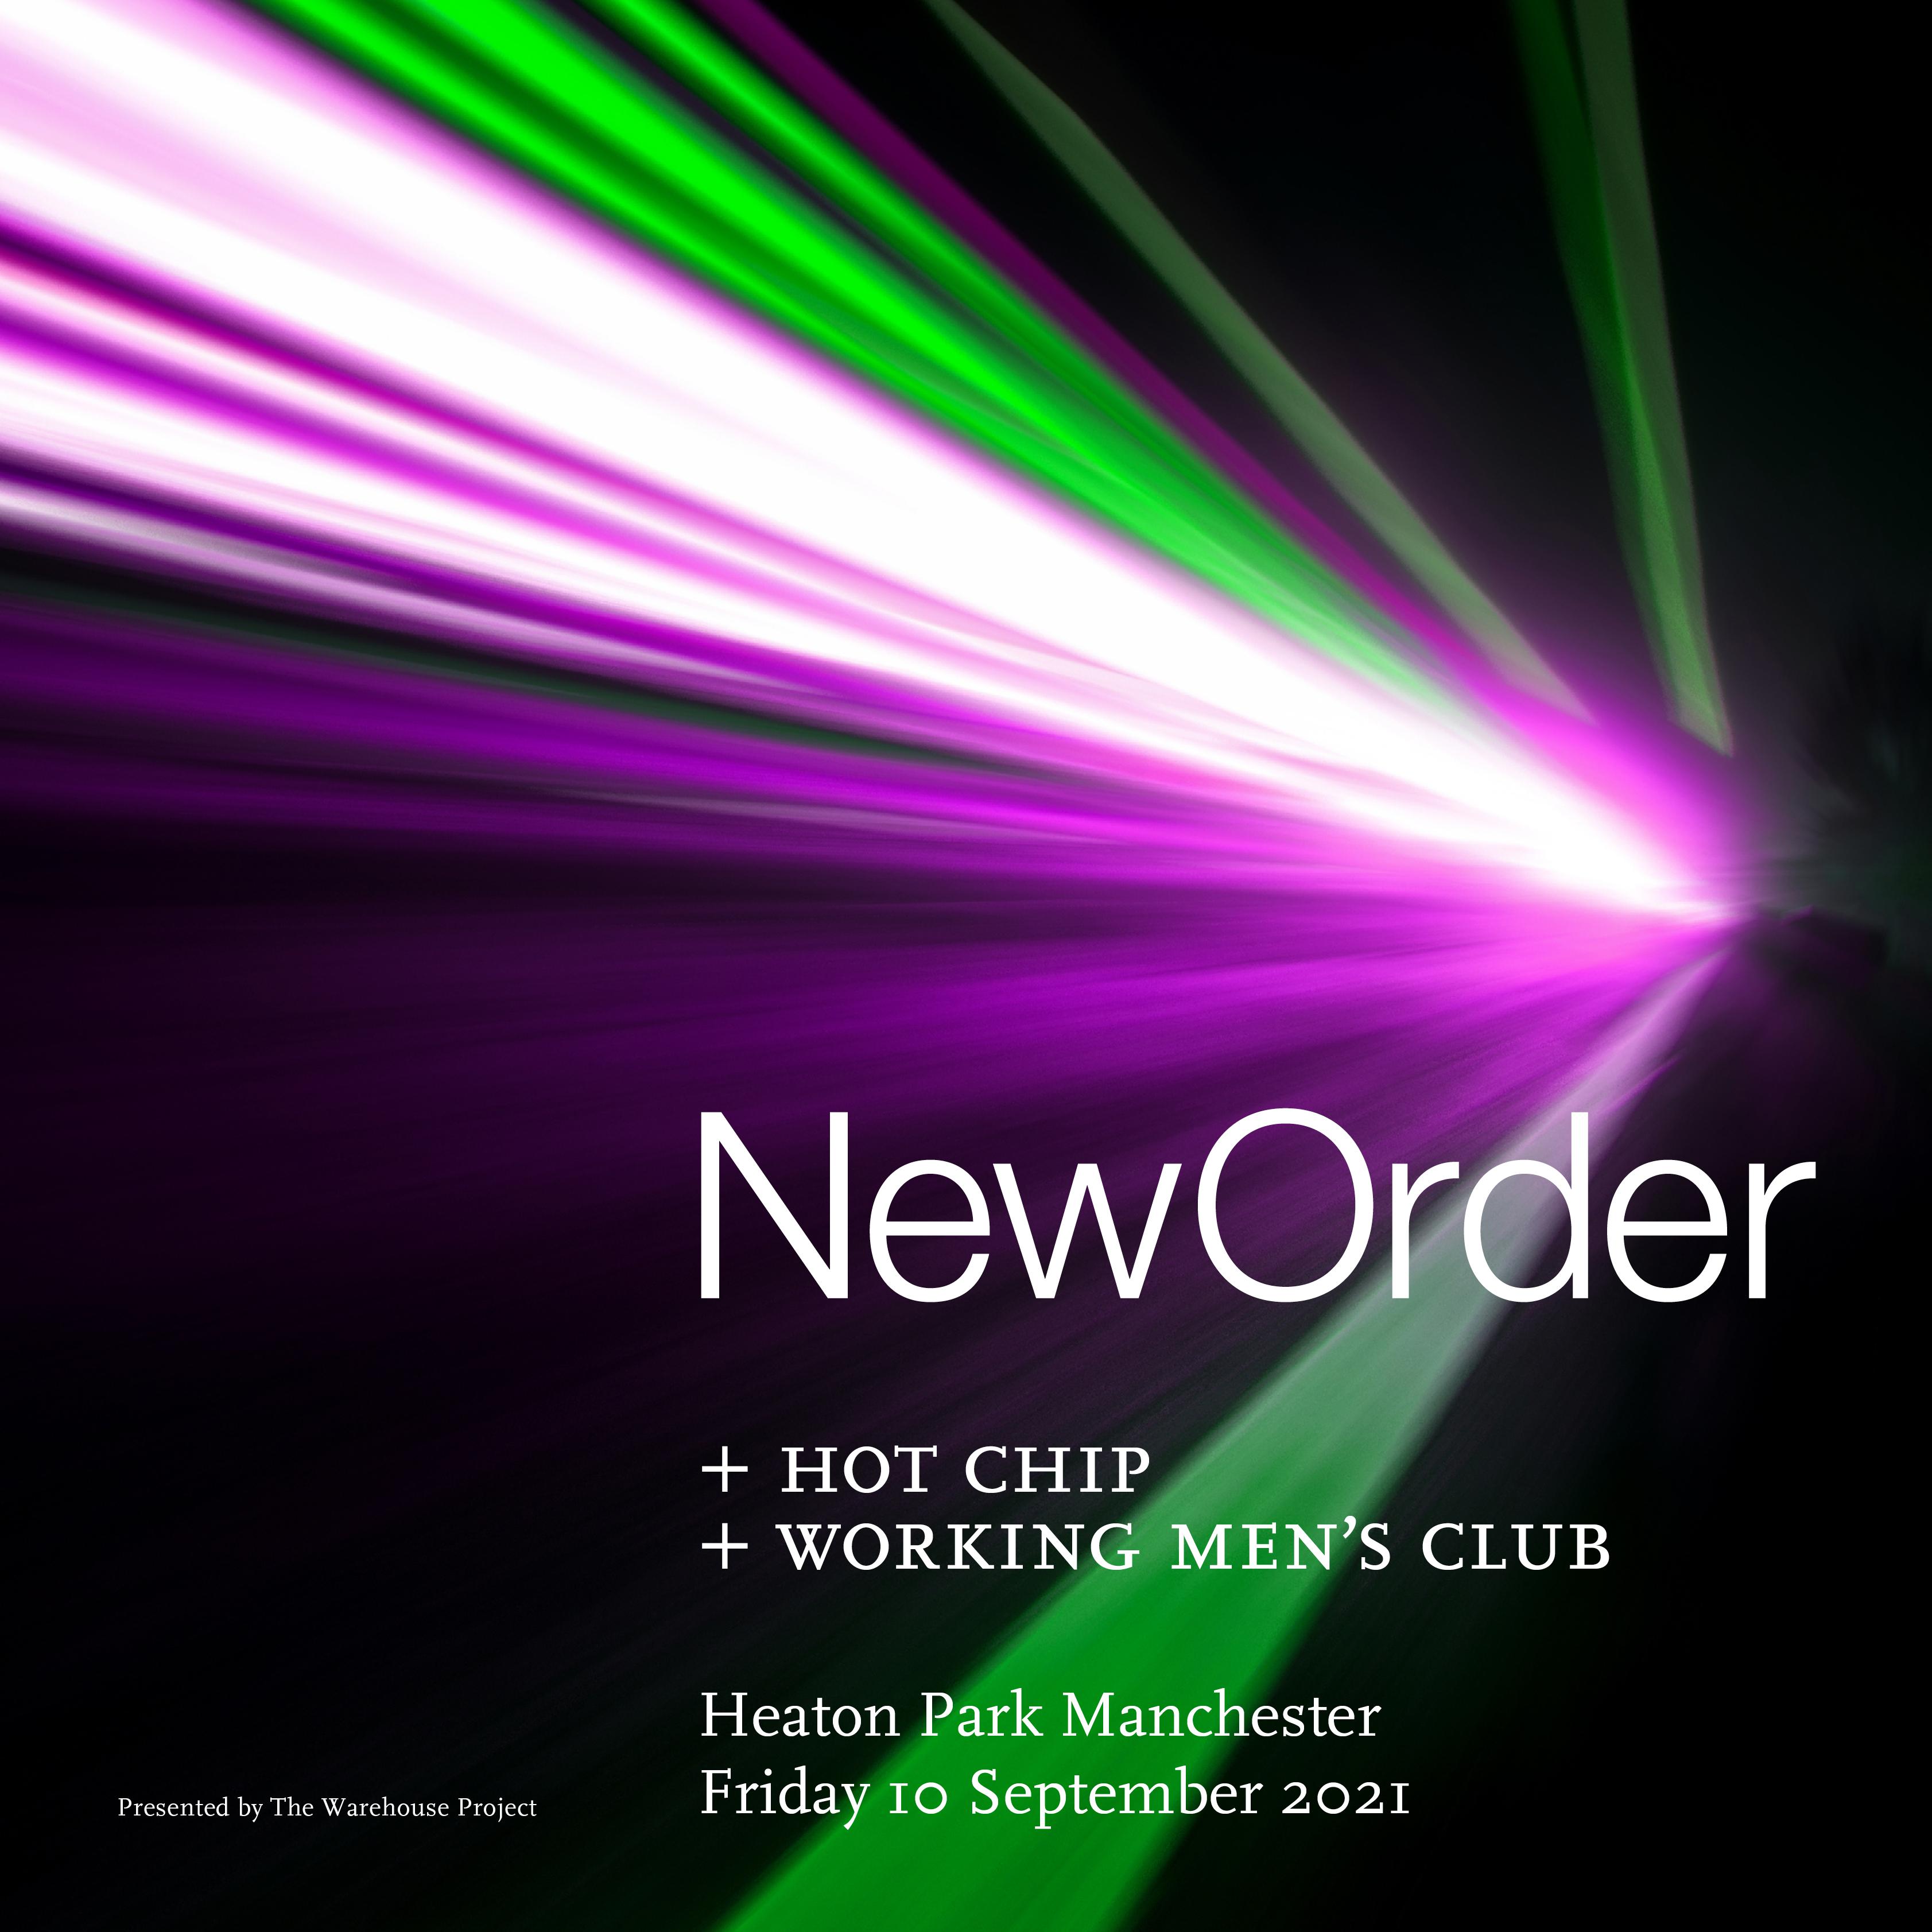 New Order at Heaton Park